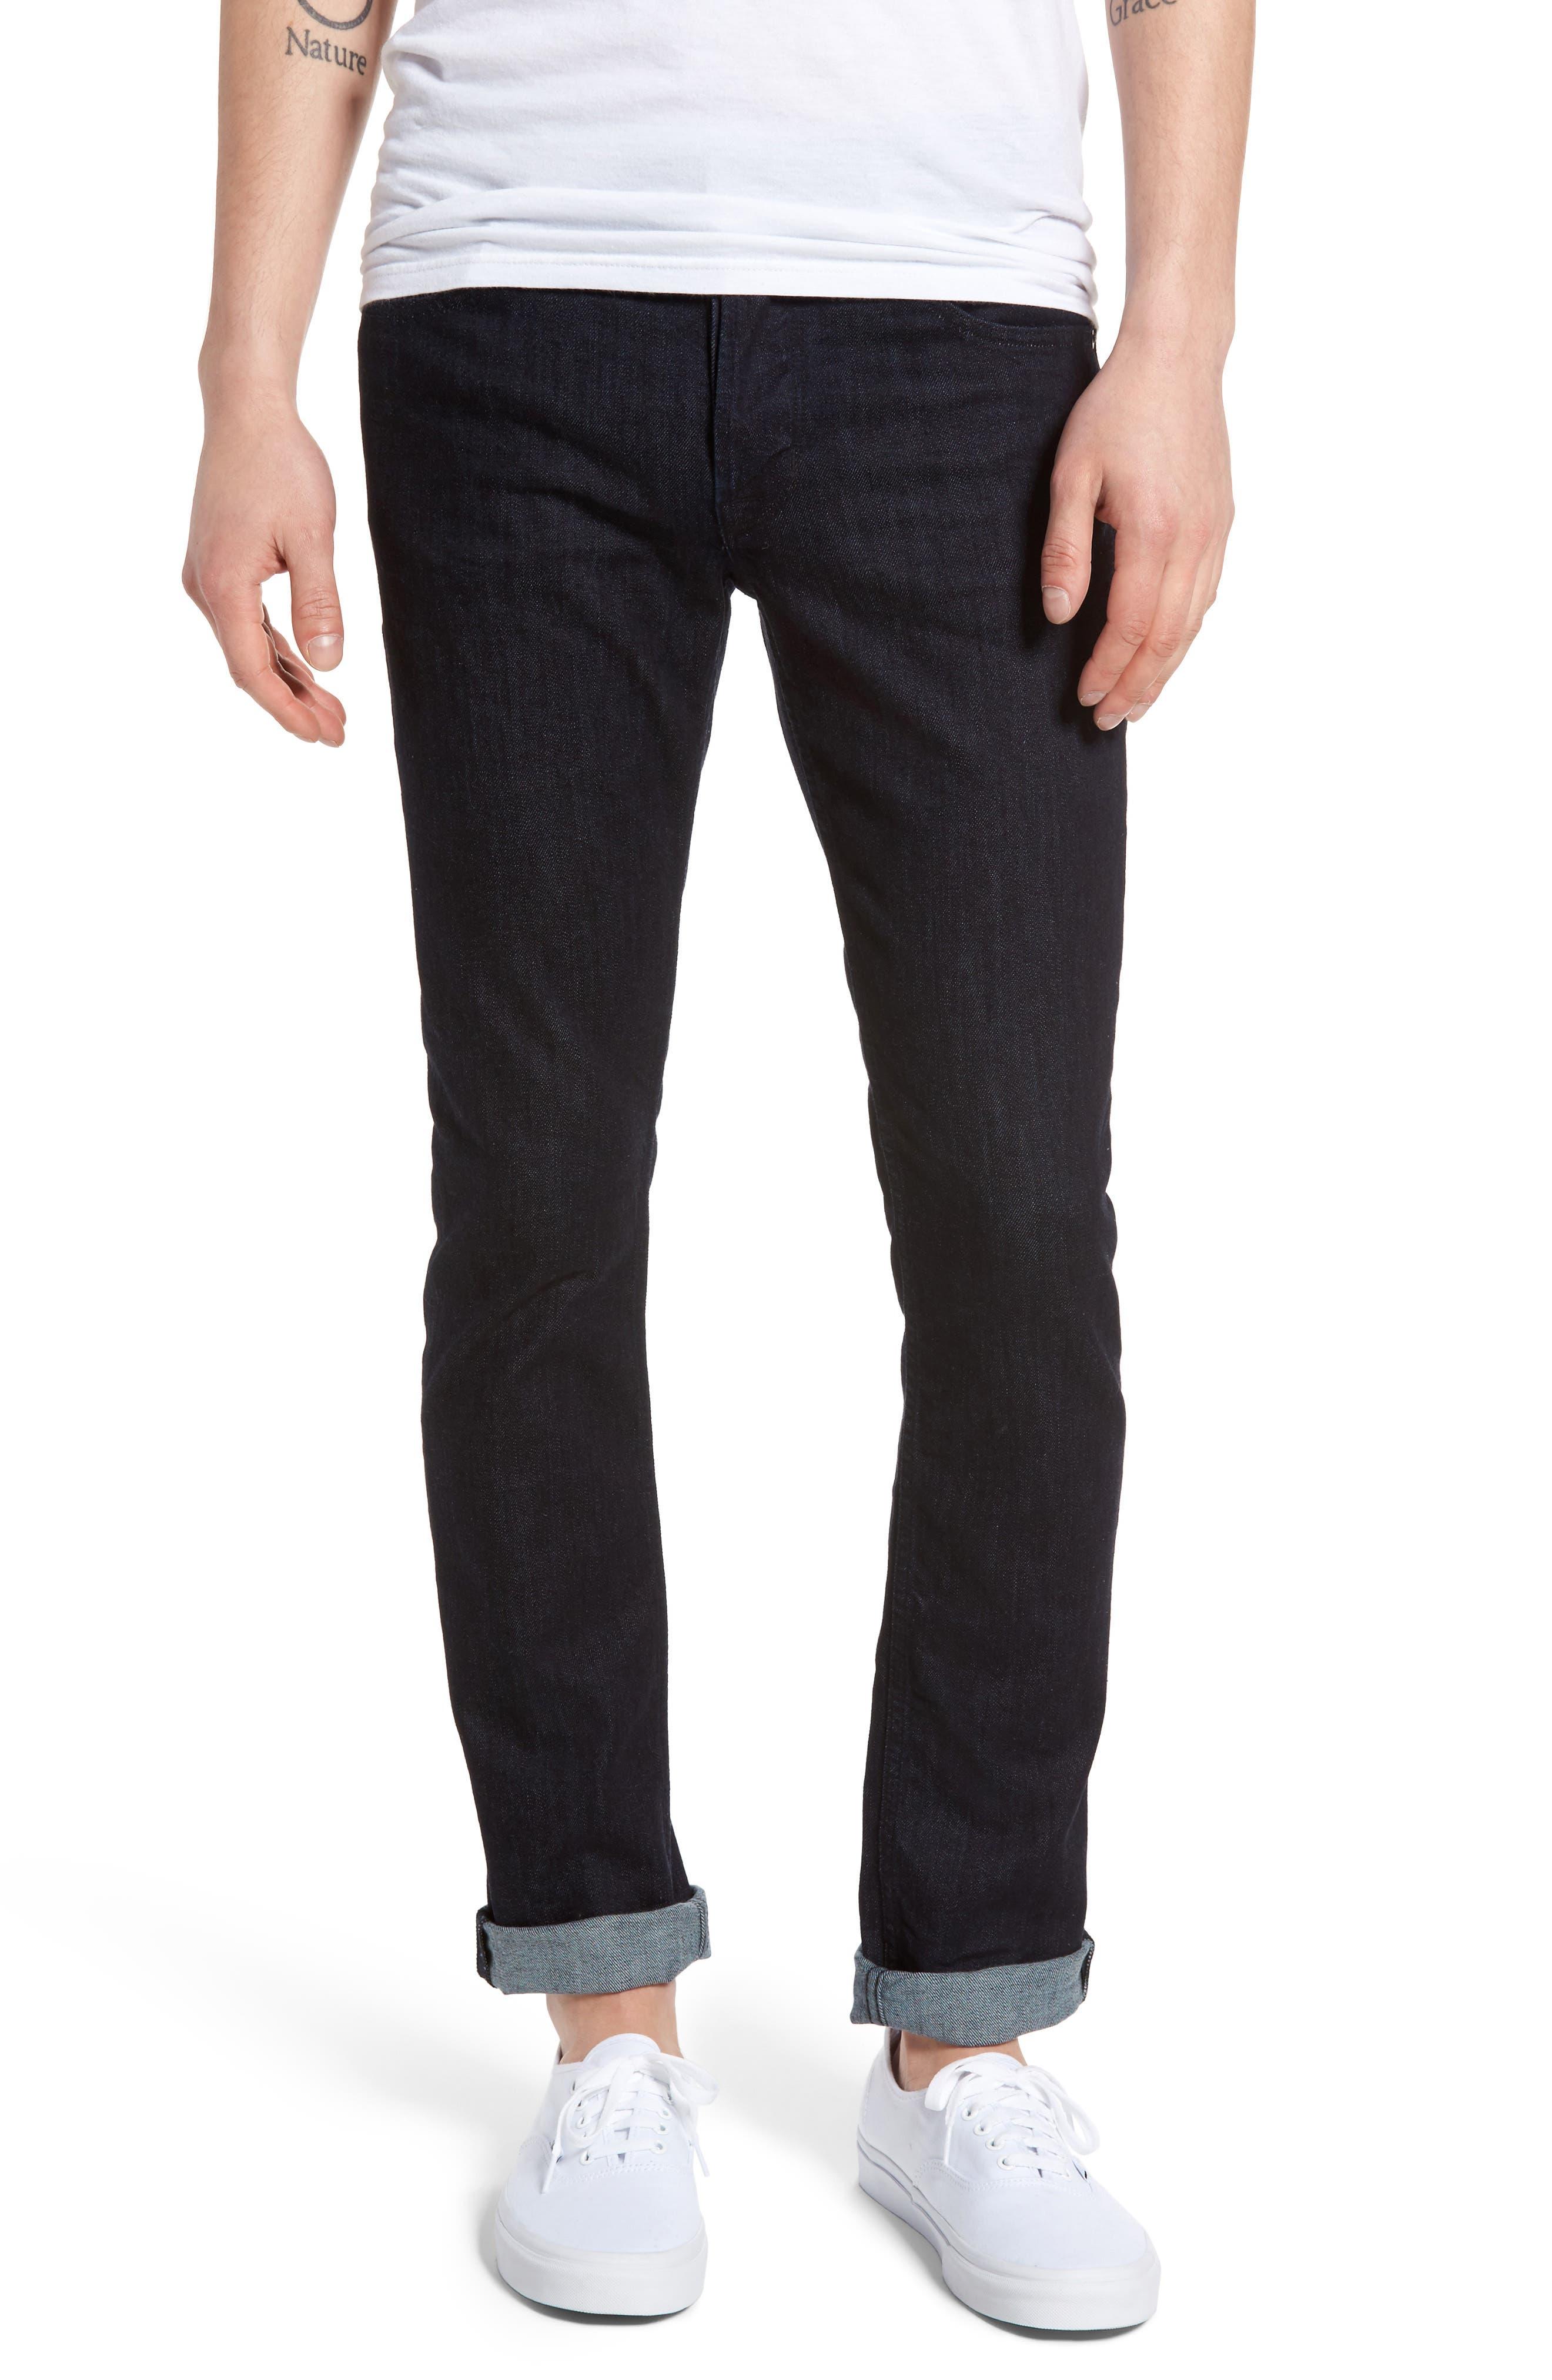 Alternate Image 1 Selected - Hudson Jeans Axl Skinny Fit Jeans (Firestone)